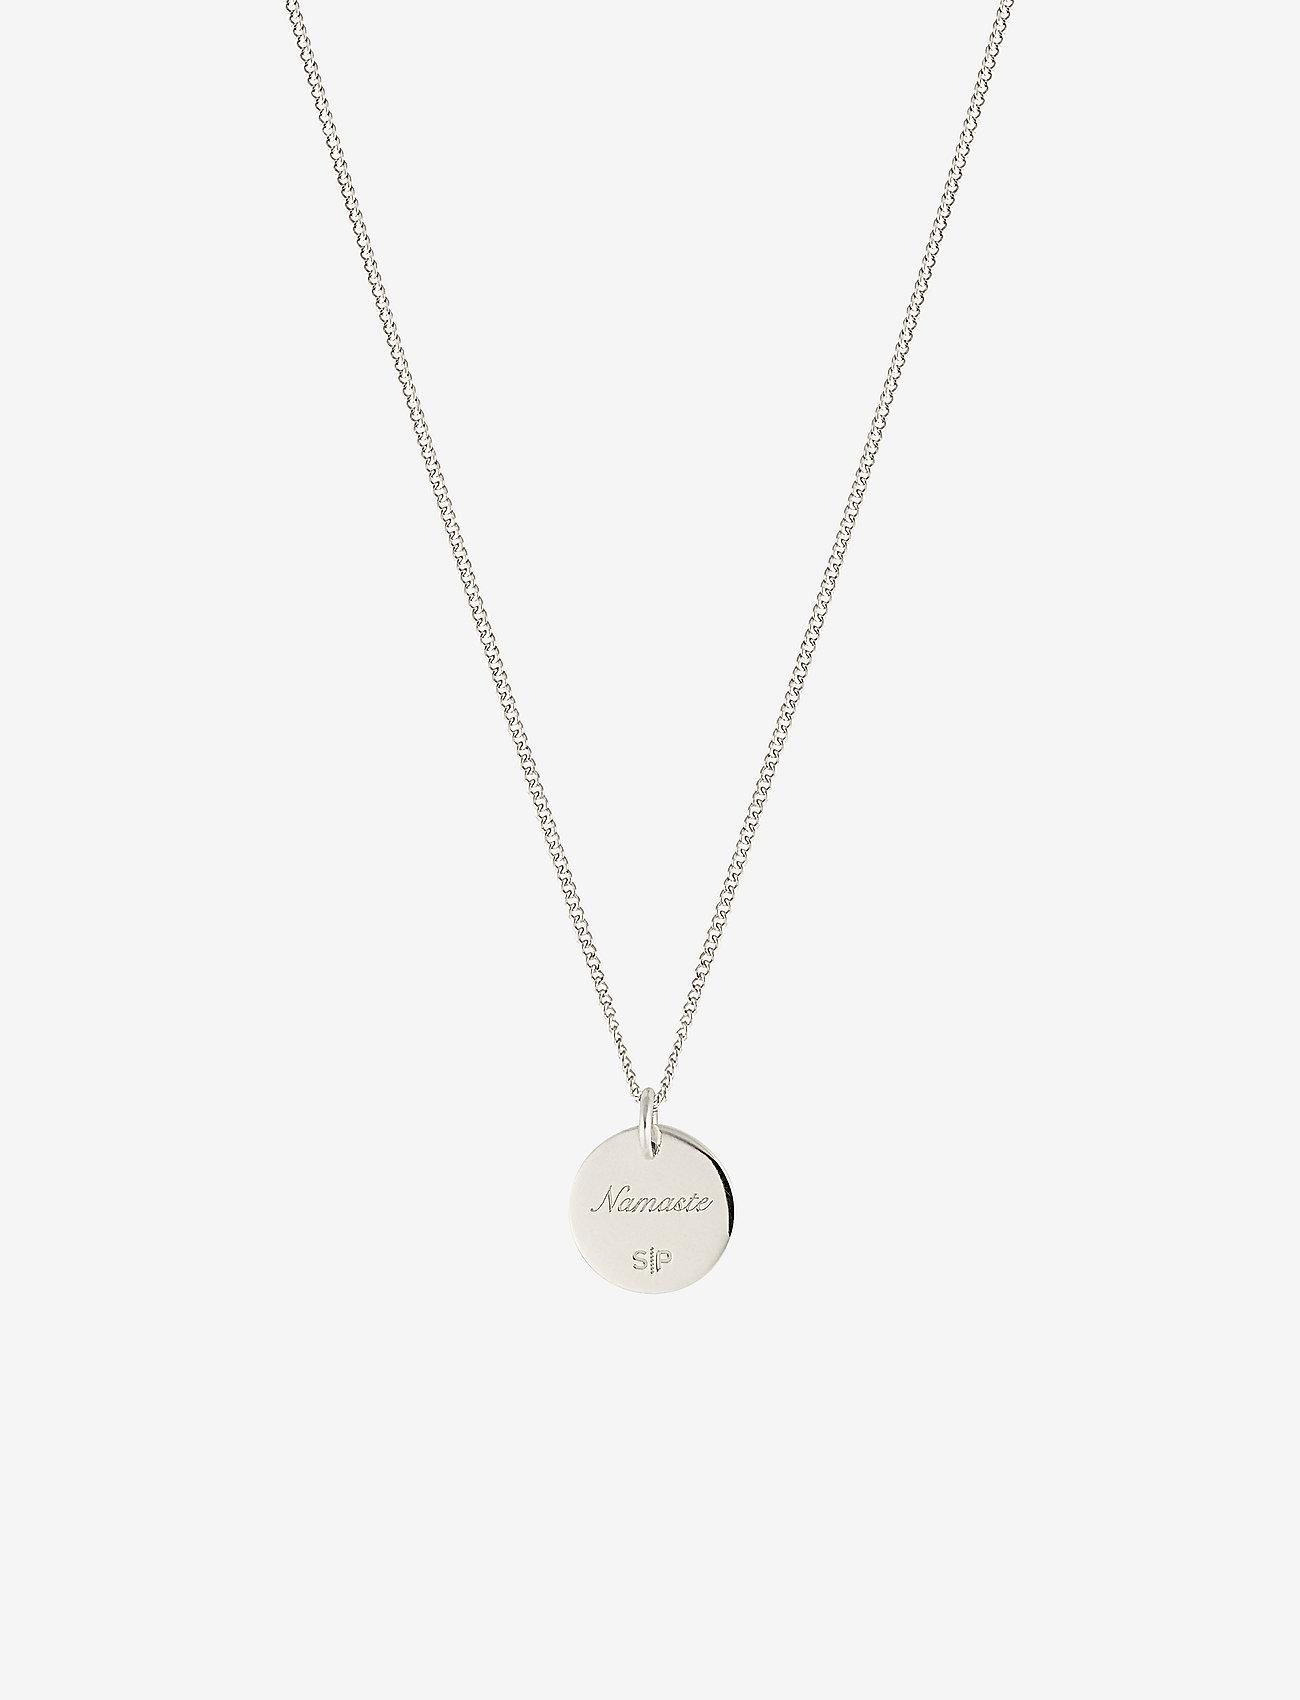 Syster P Karma Necklace Namaste - Biżuteria SILVER - Akcesoria